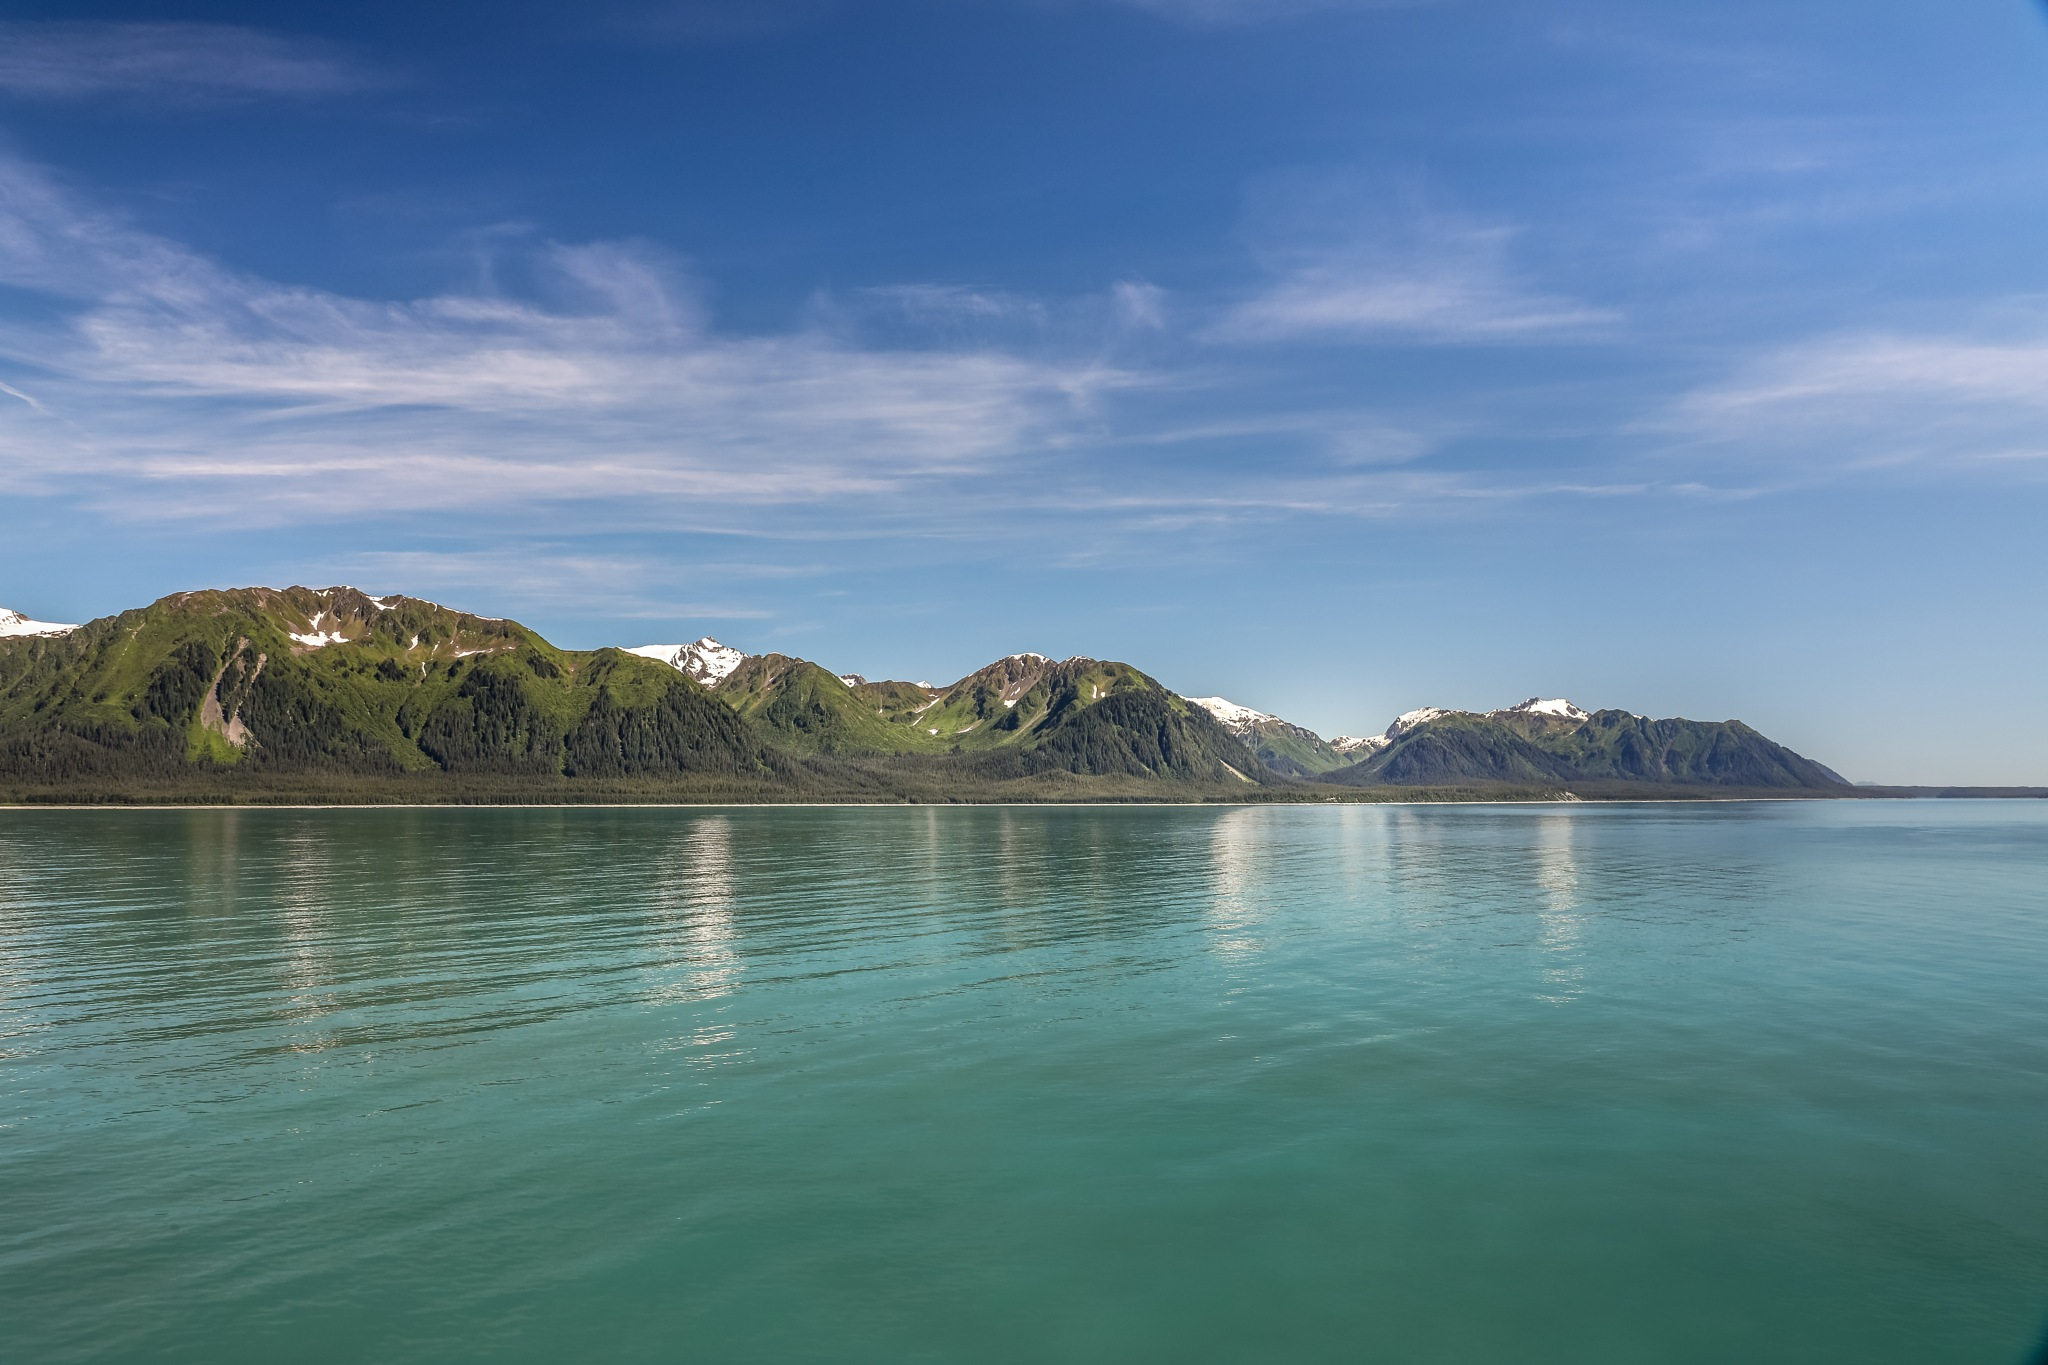 Alaskan coastline by Martina Birnbaum